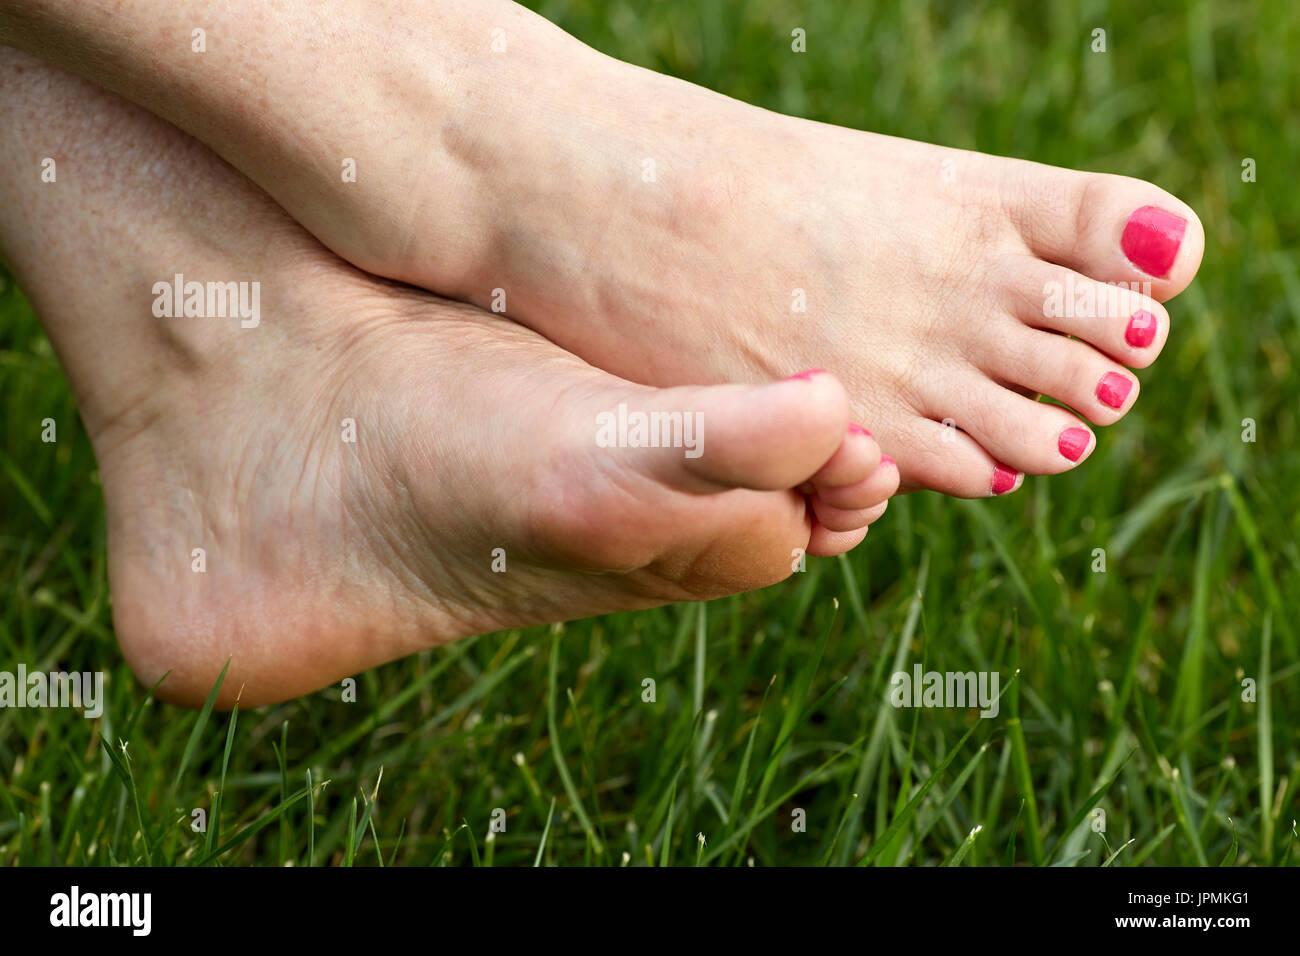 foto donne in collant lucidi piedi scalzi di donne